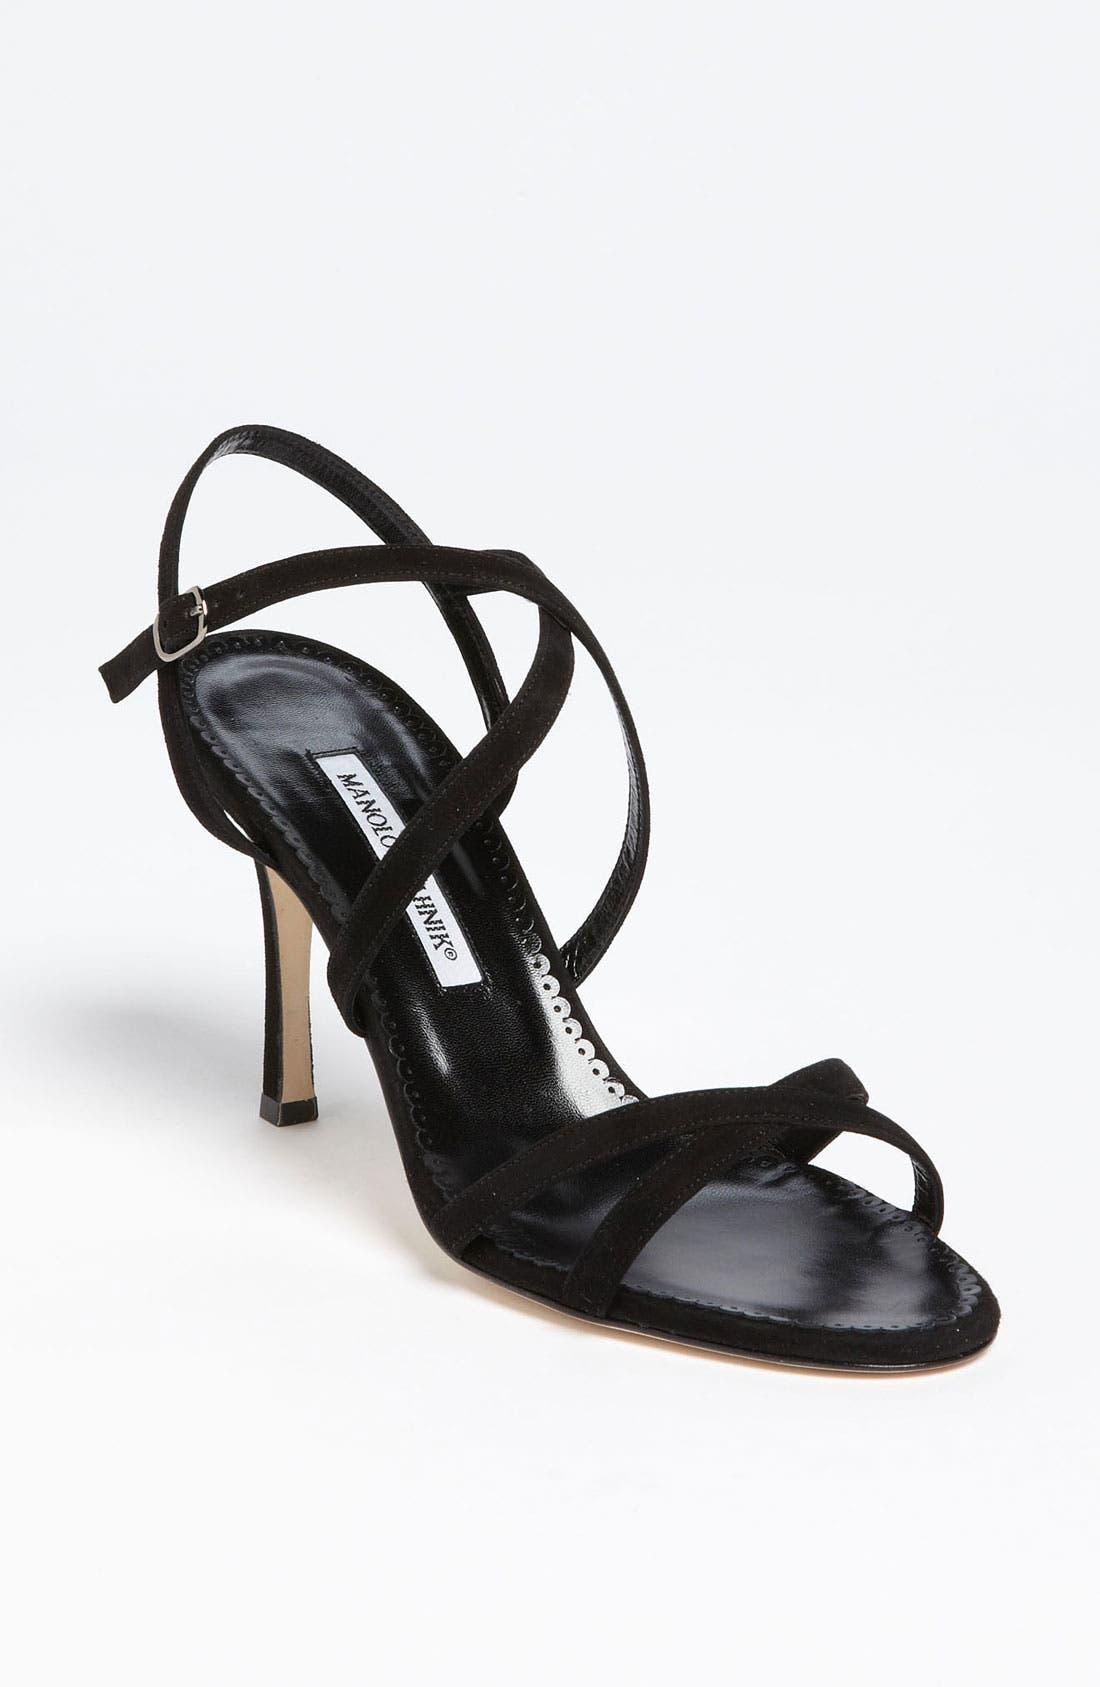 Alternate Image 1 Selected - Manolo Blahnik 'Bayan' Sandal